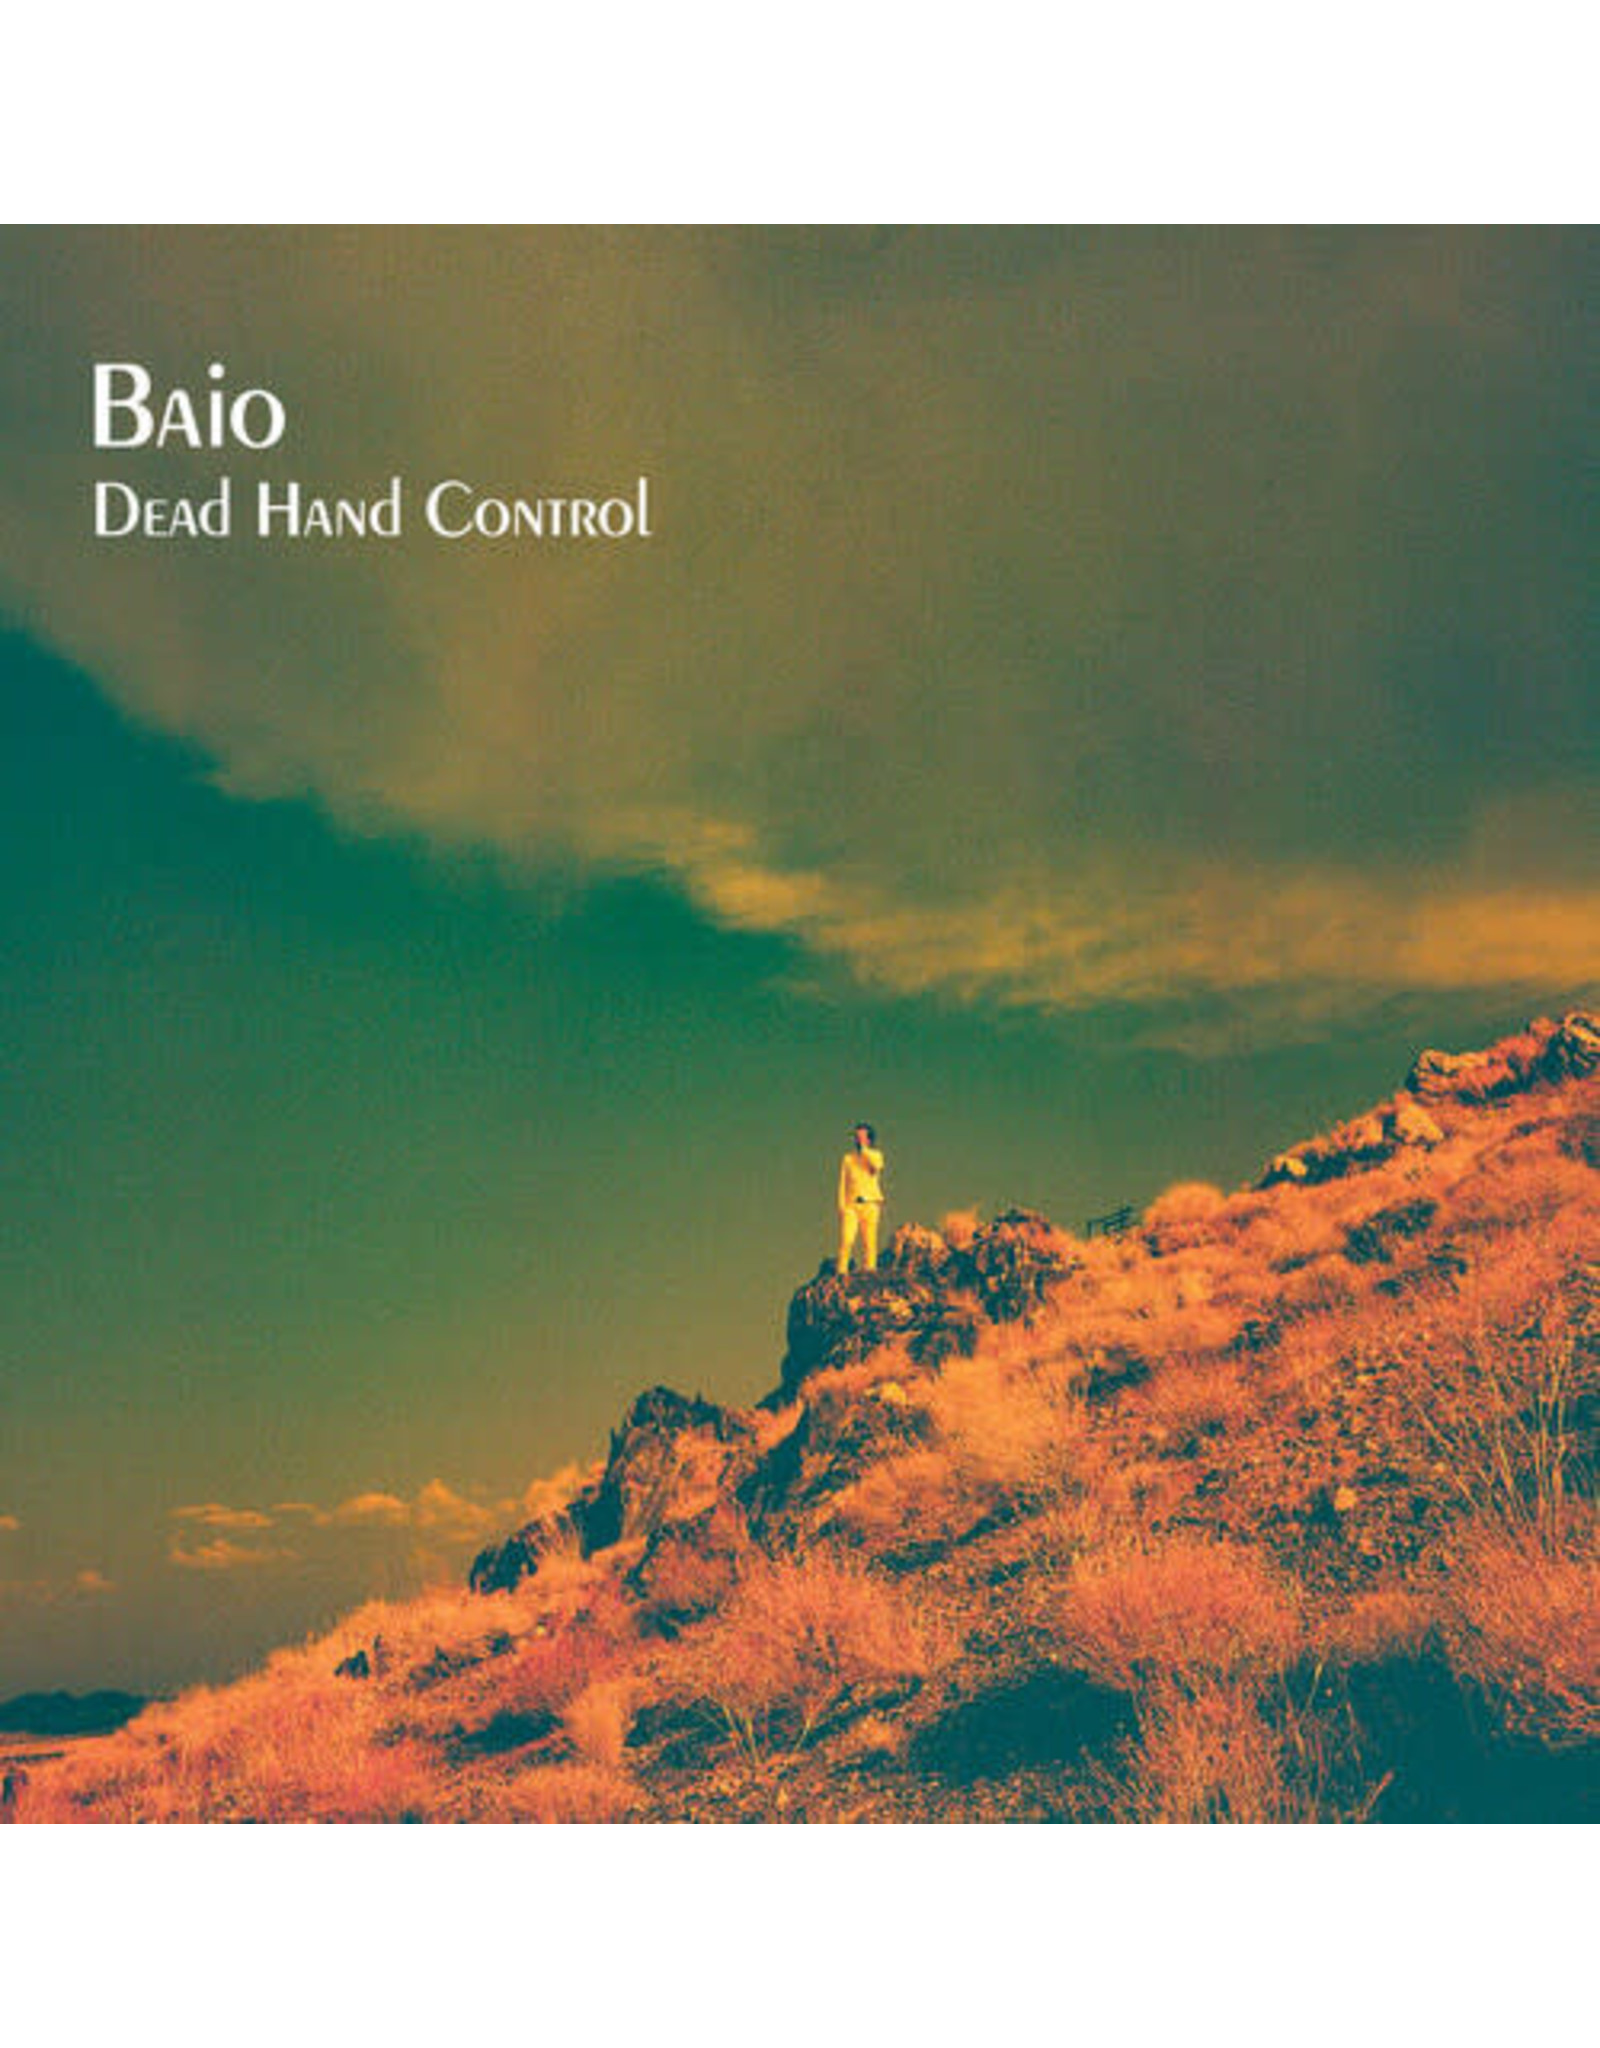 New Vinyl Baio - Dead Hand Control (Colored) LP